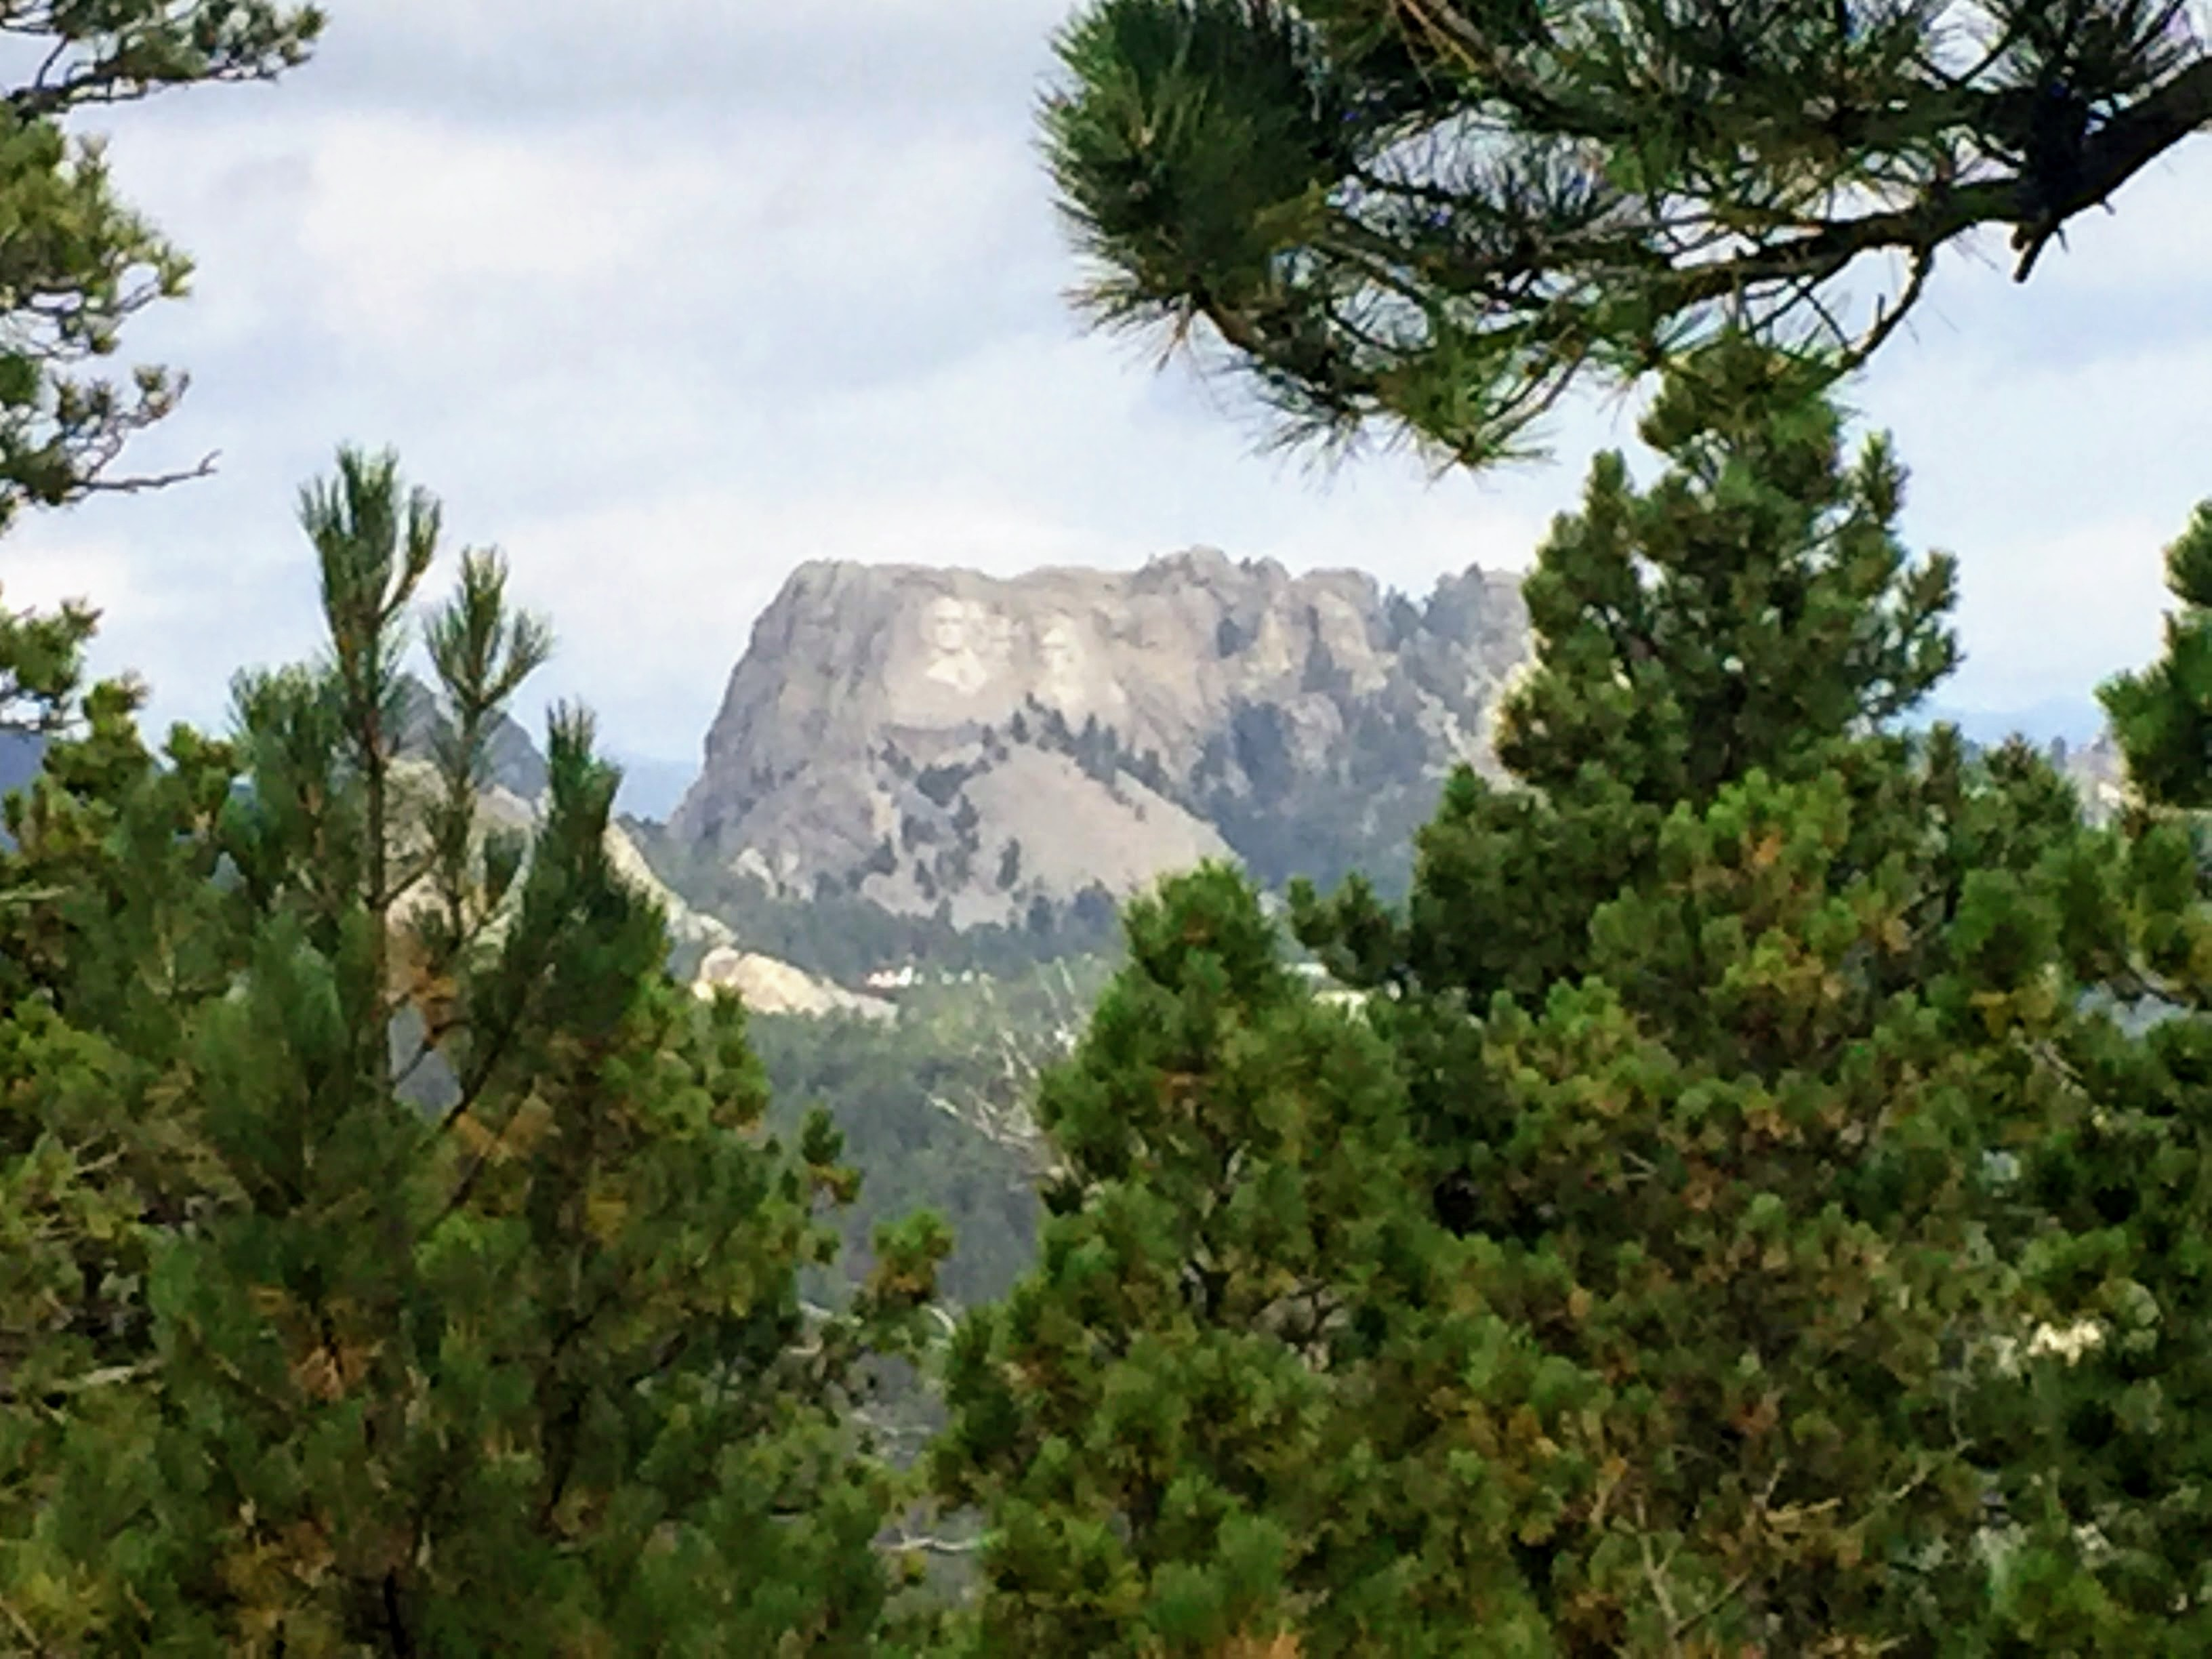 2017-09-17 Black Hills 21 Mt Rushmore 05